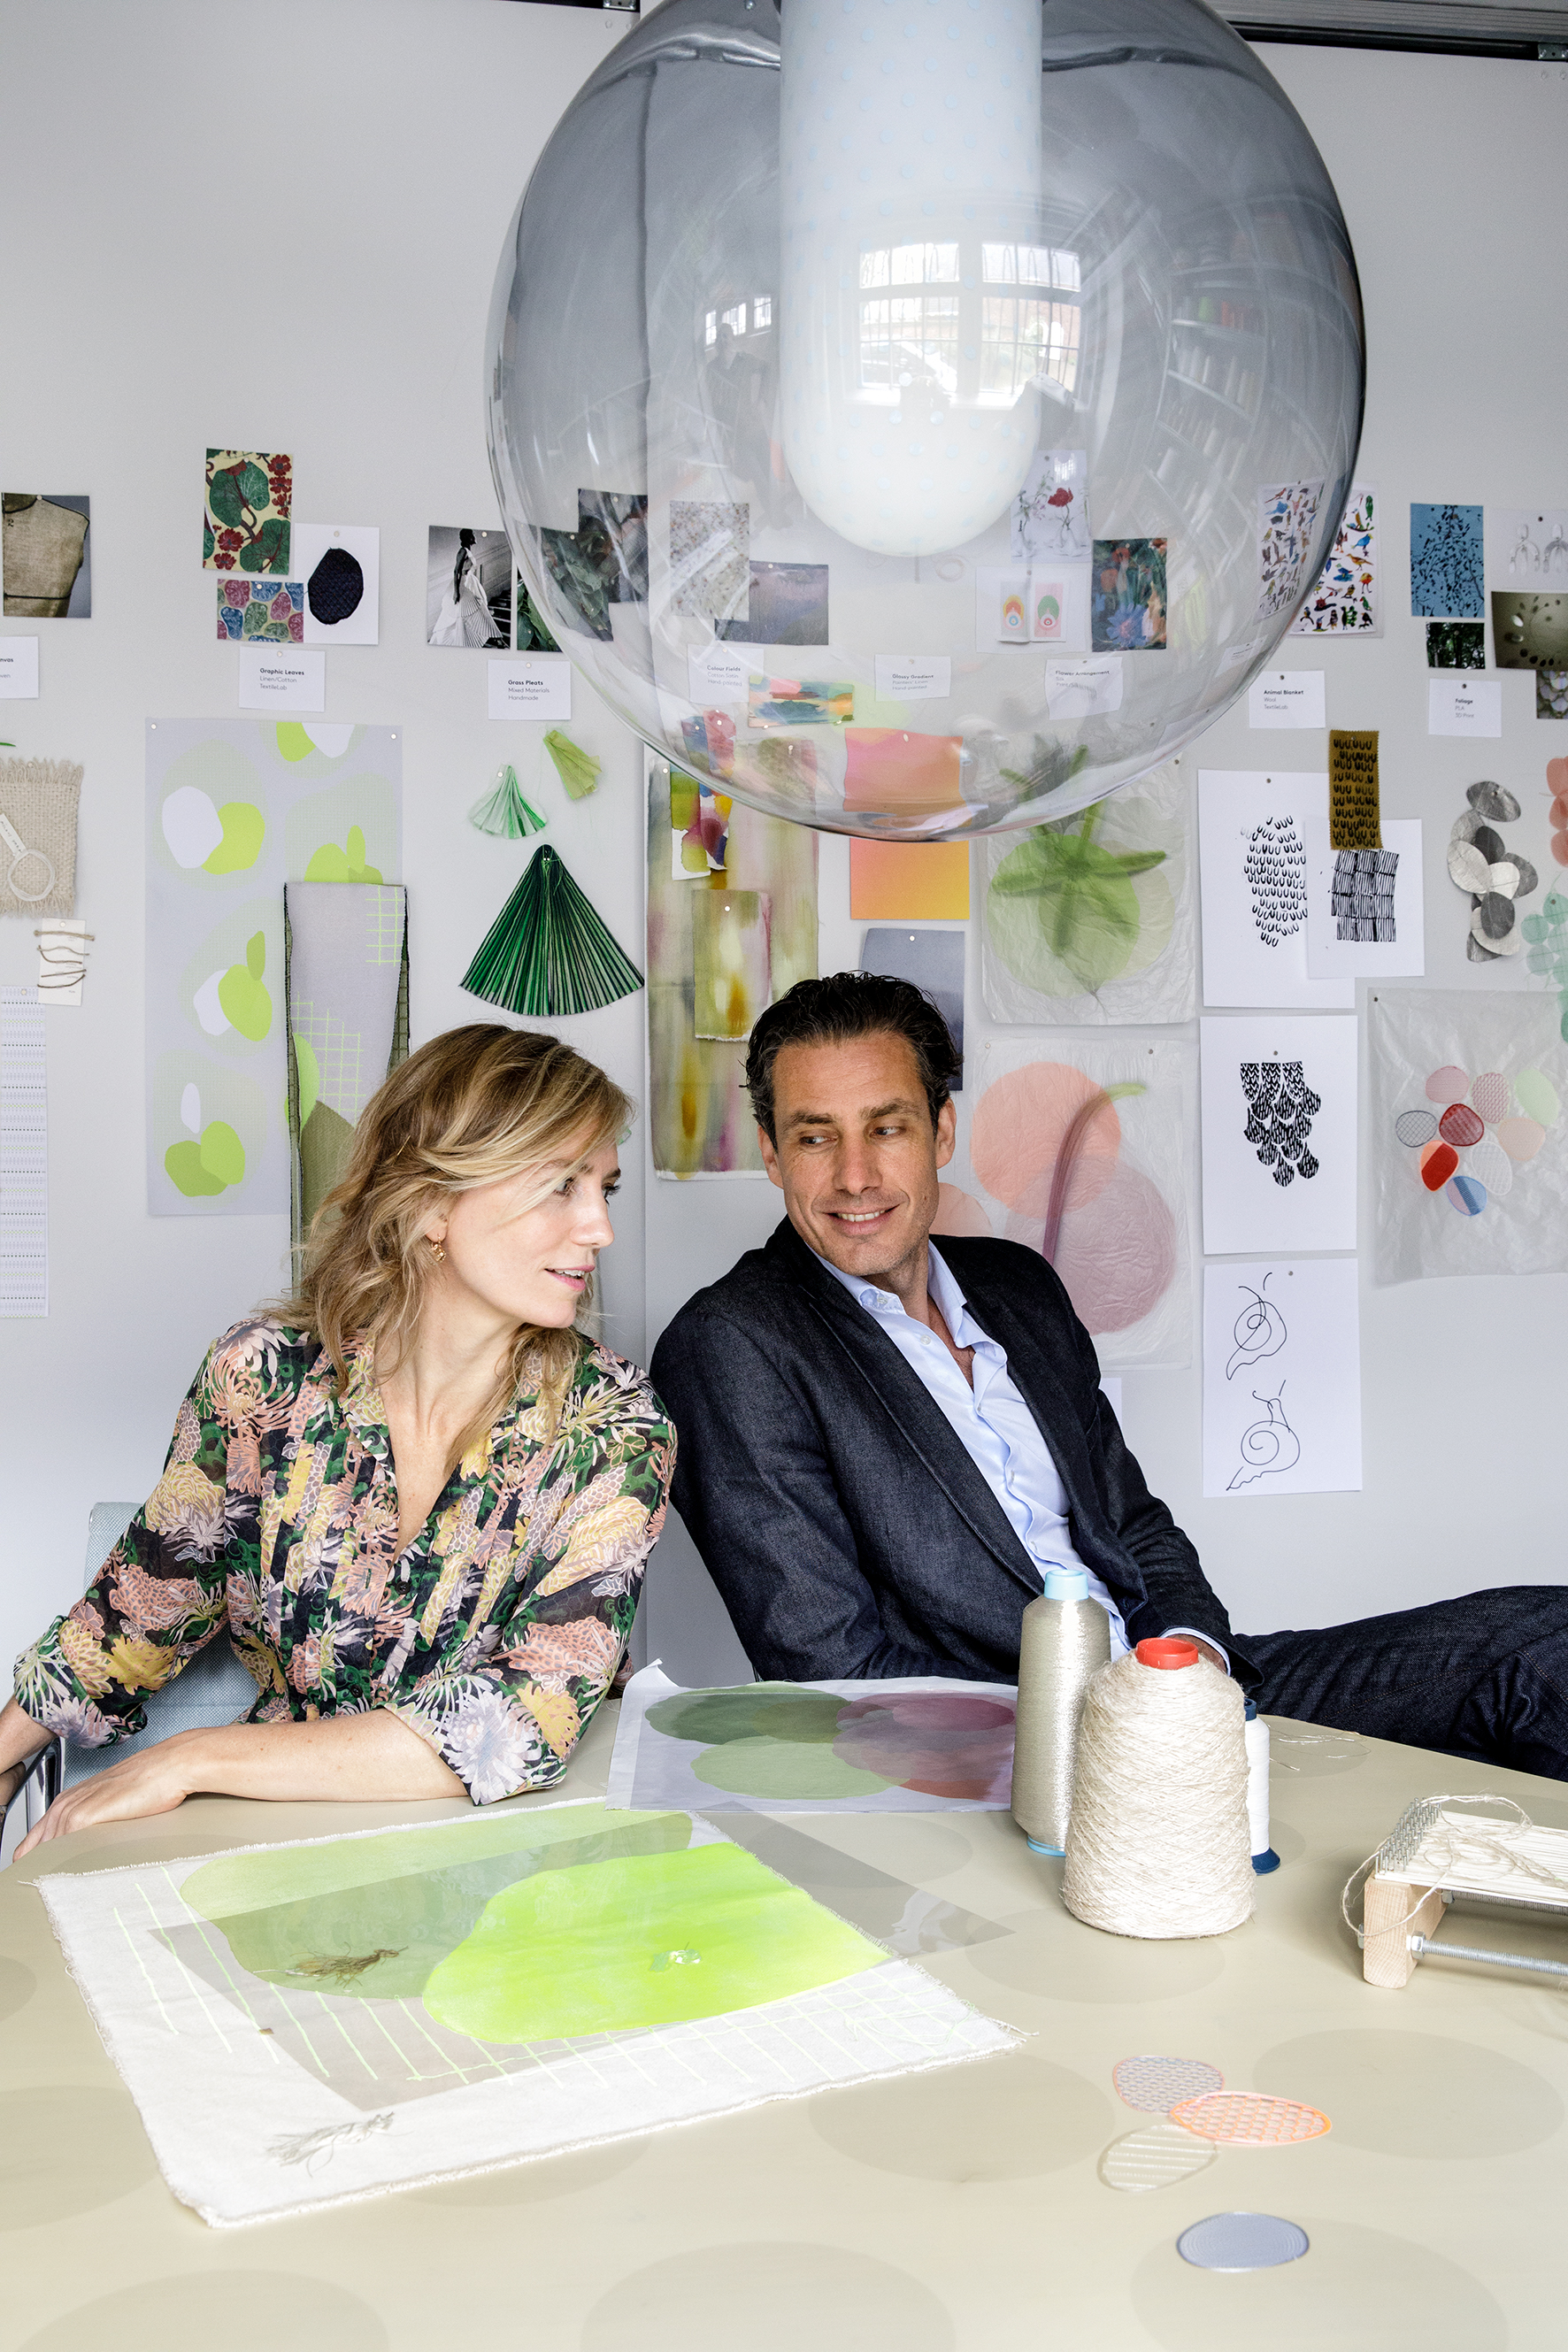 Stefan Scholten and Carole Baijings. Photo by Inga Powilleit.